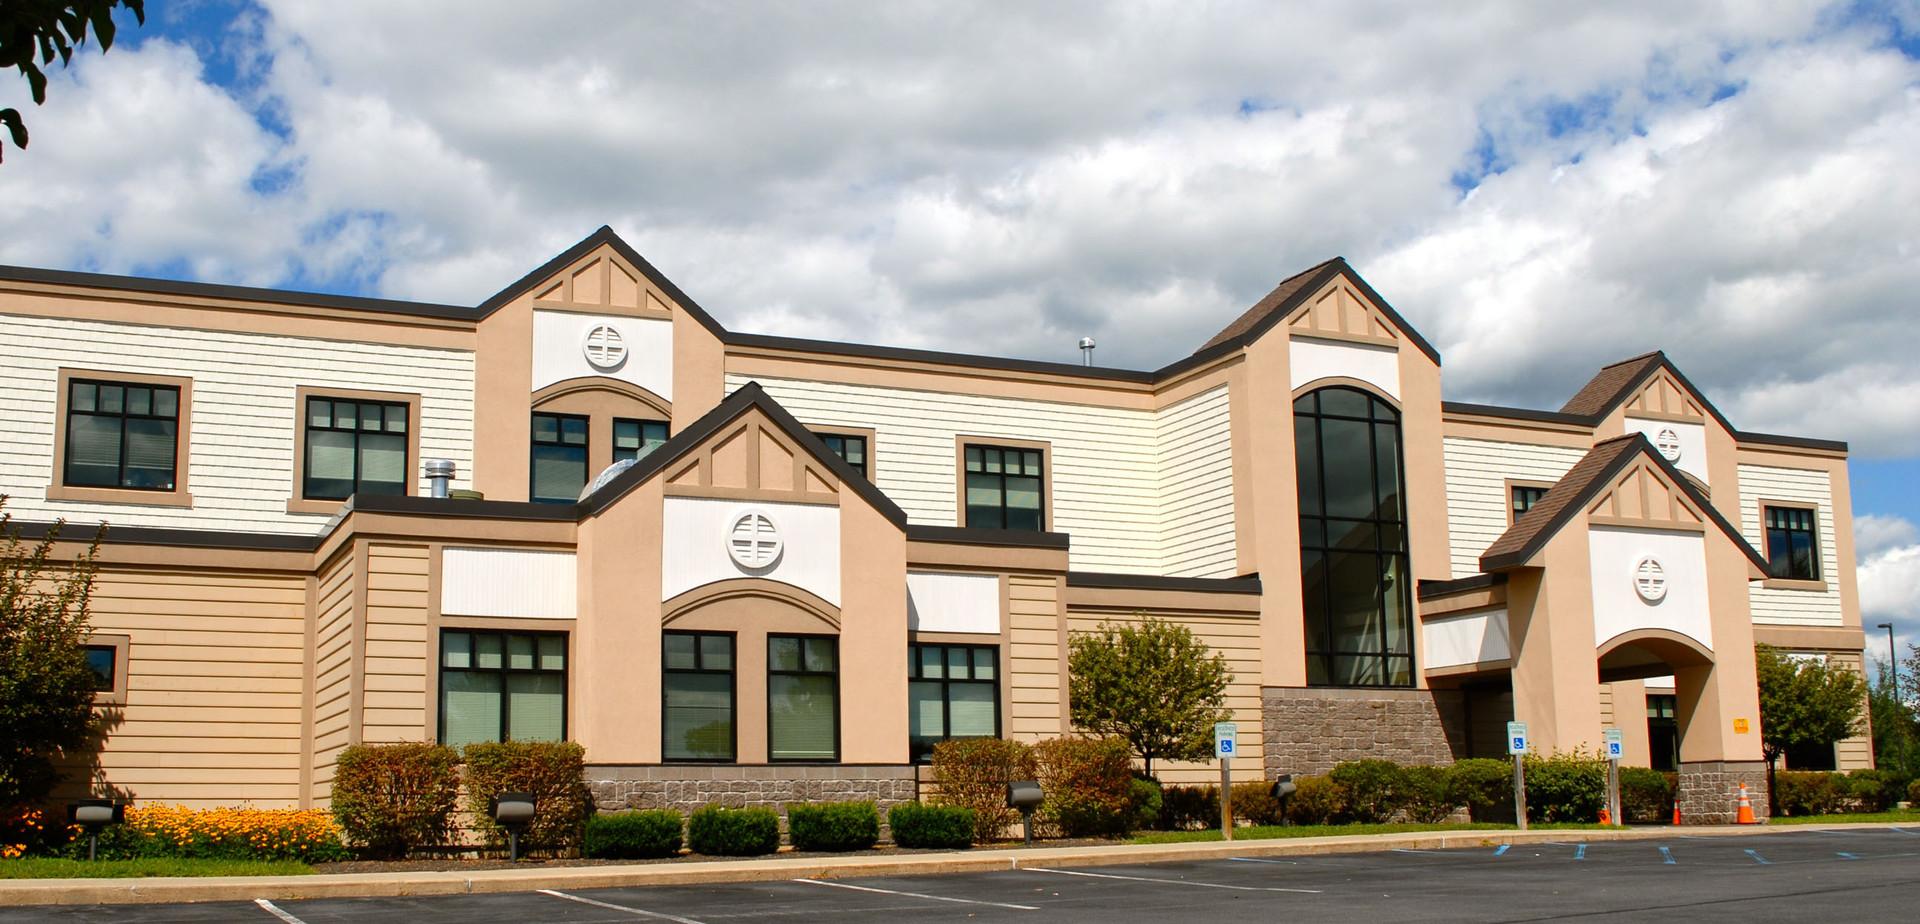 Medical Center at Wilton